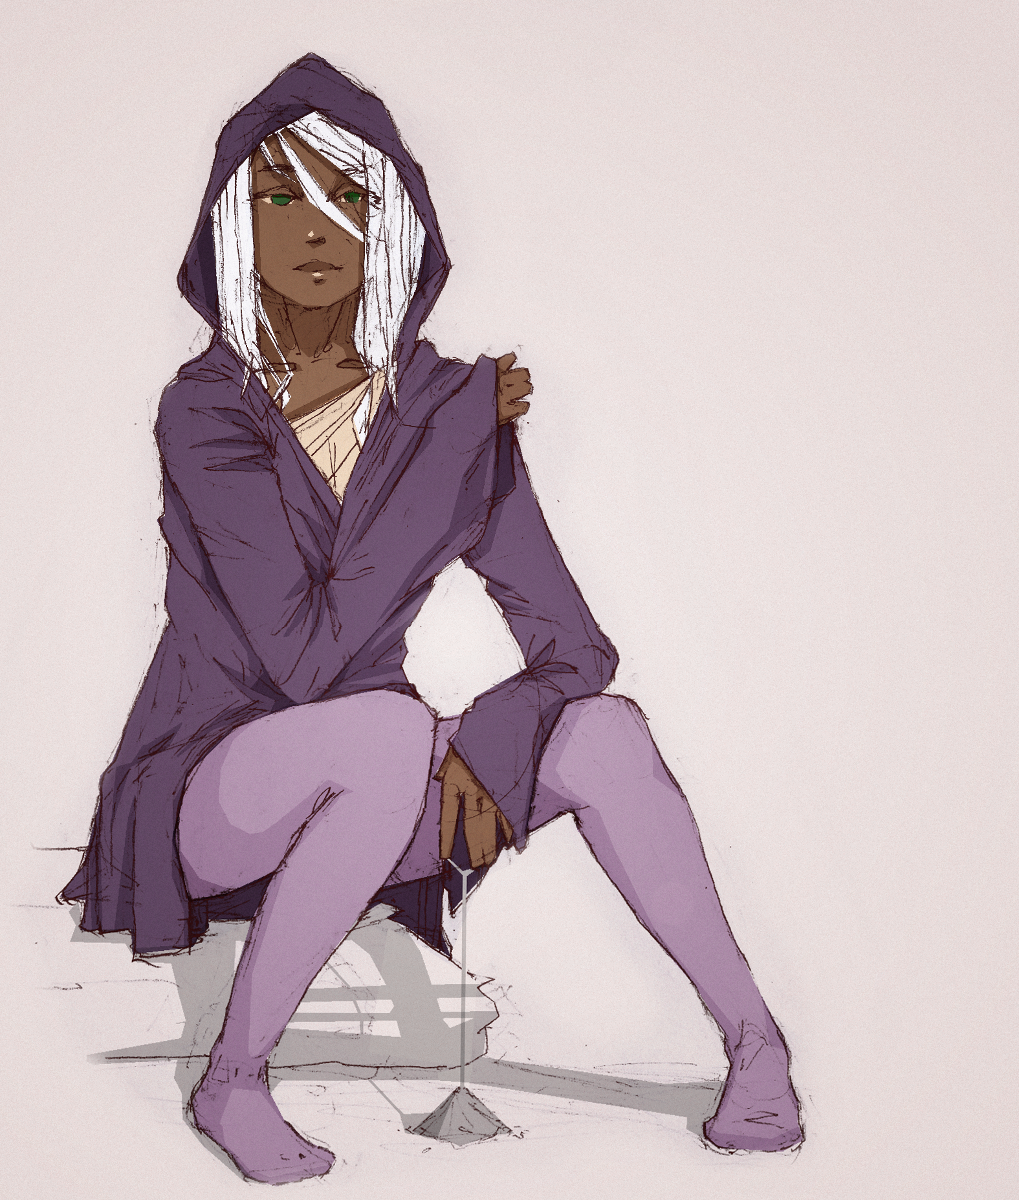 Lmrj82d Png 1019 1200 Black Anime Characters Black Women Art Girls Characters